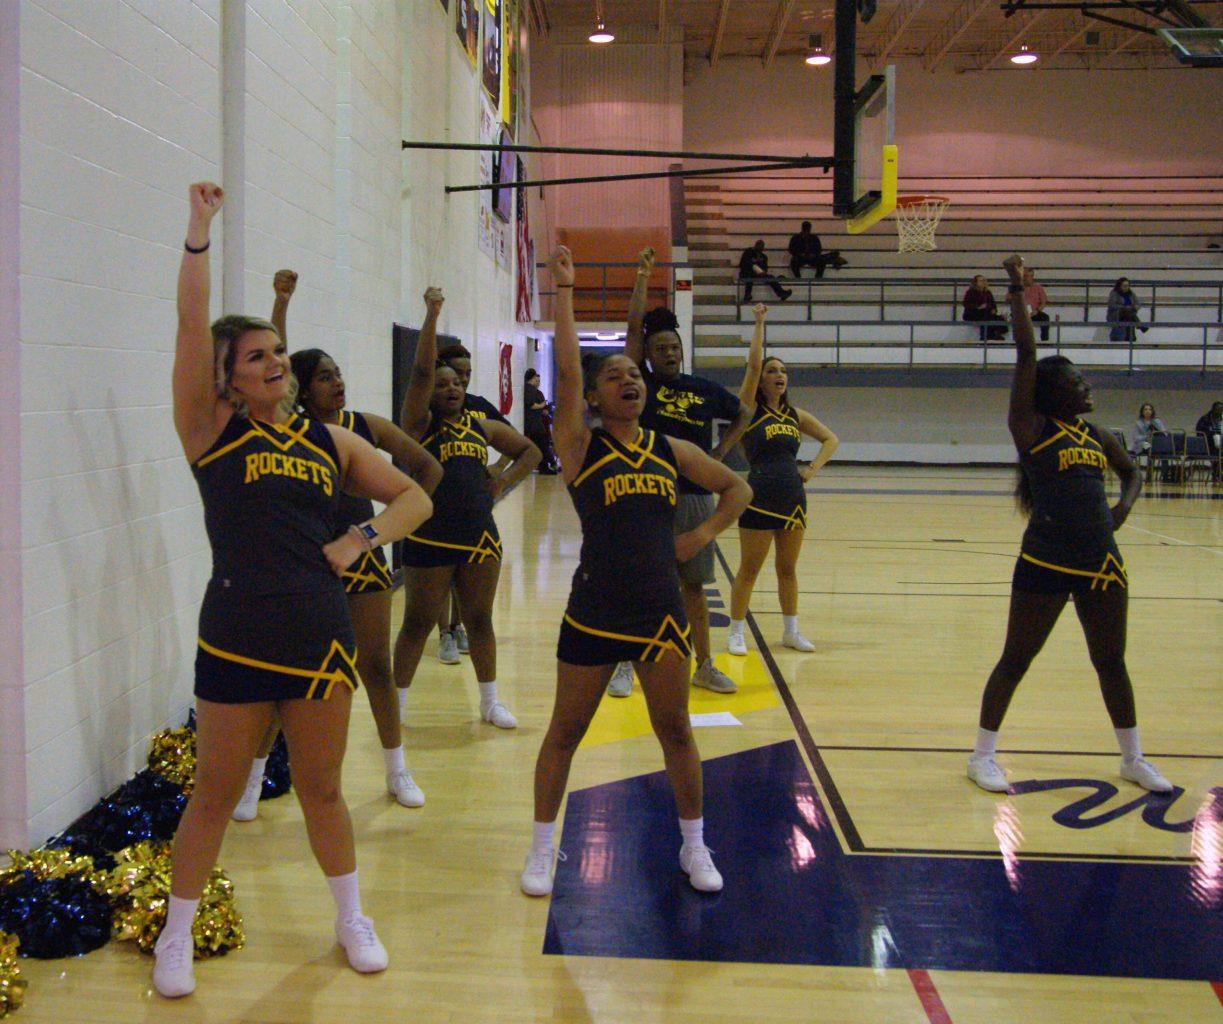 Rocket Cheer Squad